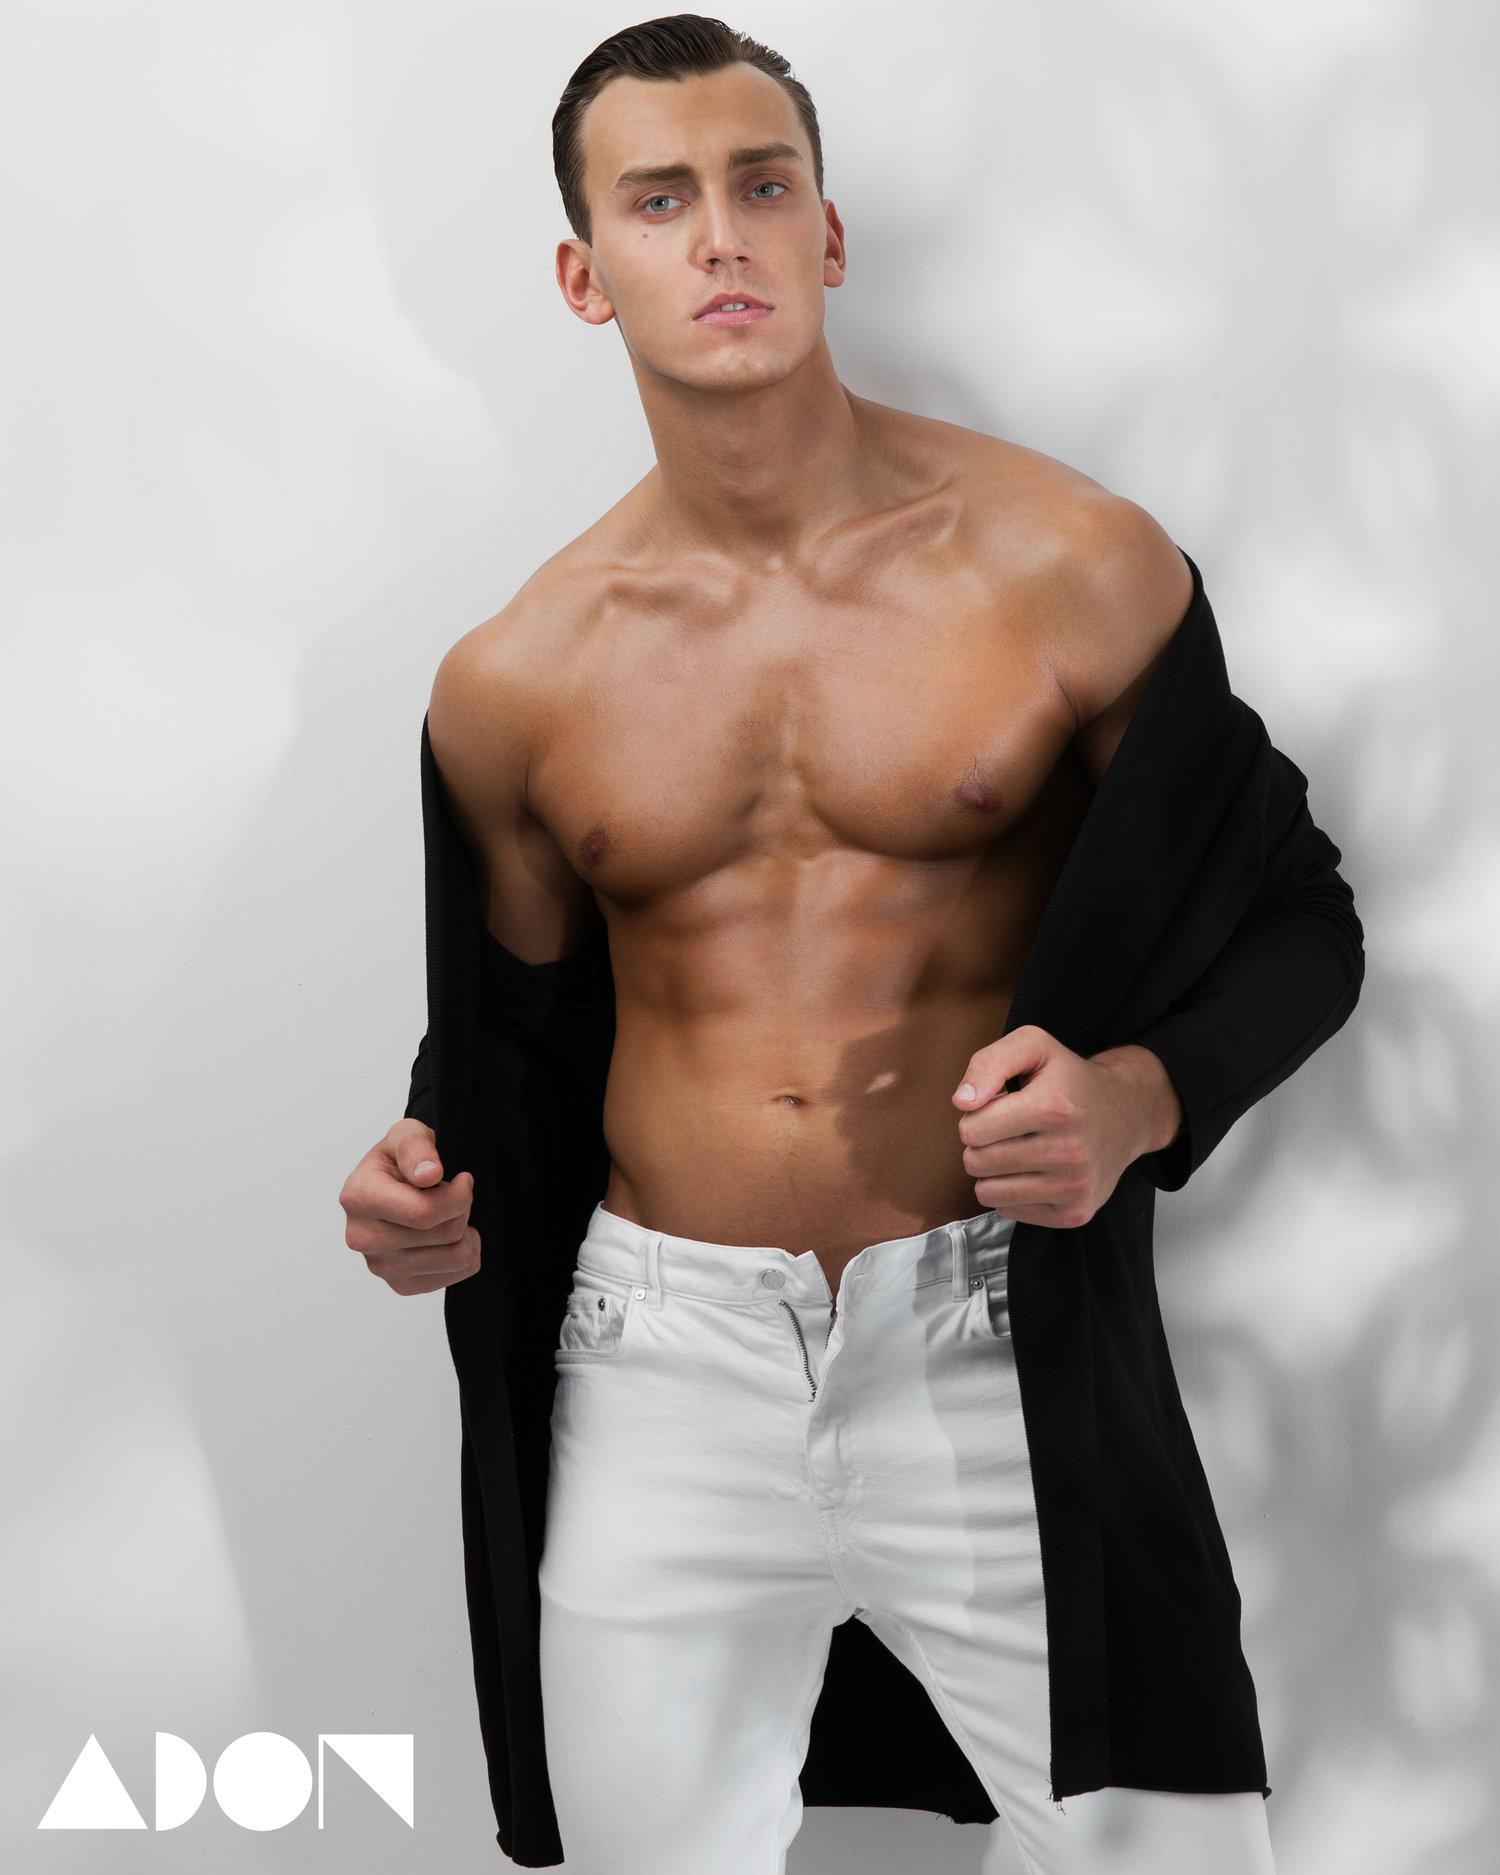 Adon Exclusive: Model Makc Zvonov By Stas Vokman